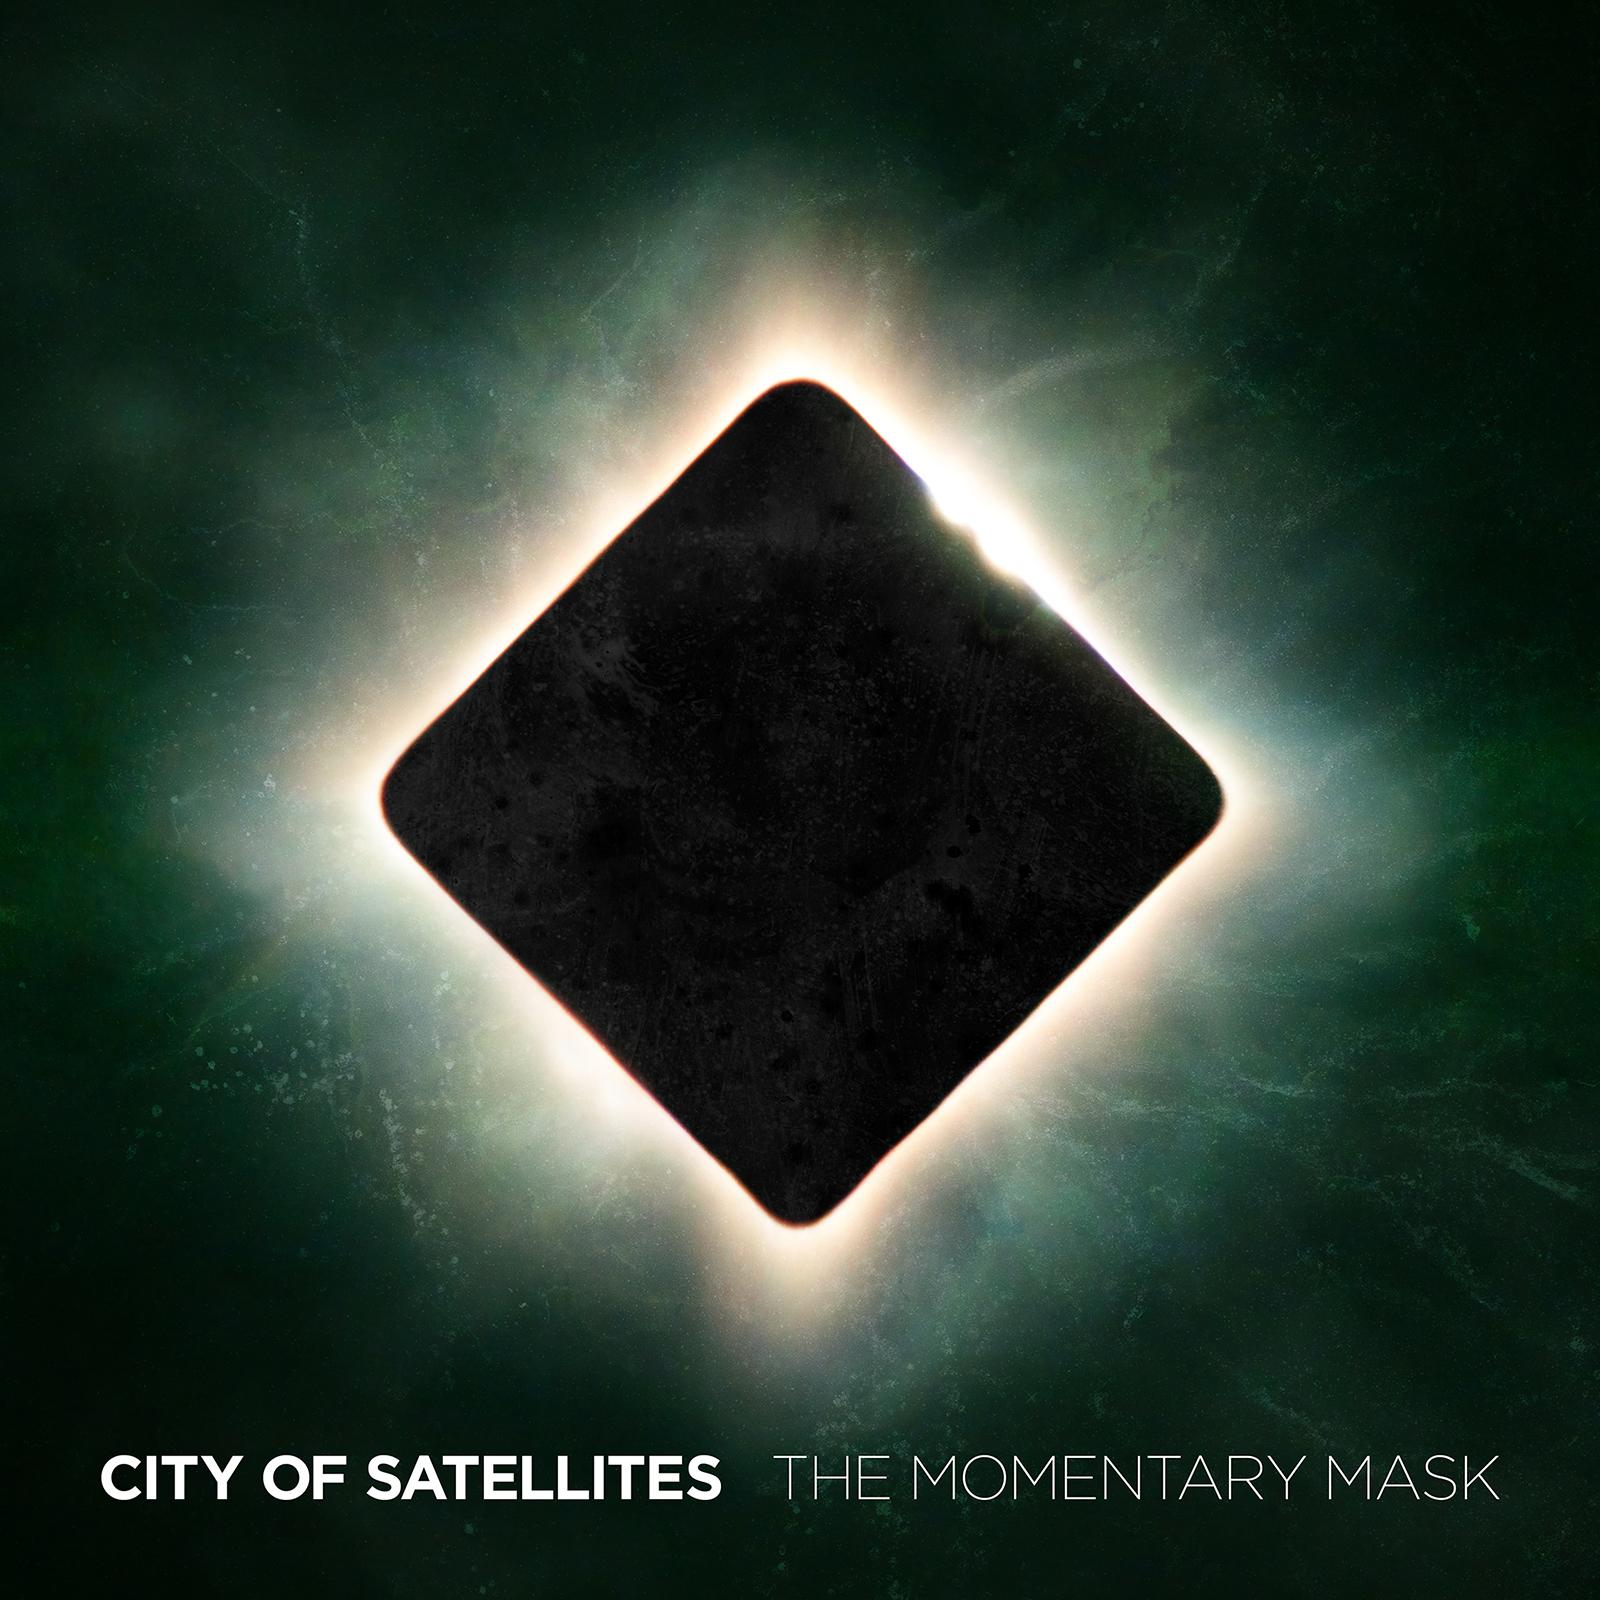 City of Satellites